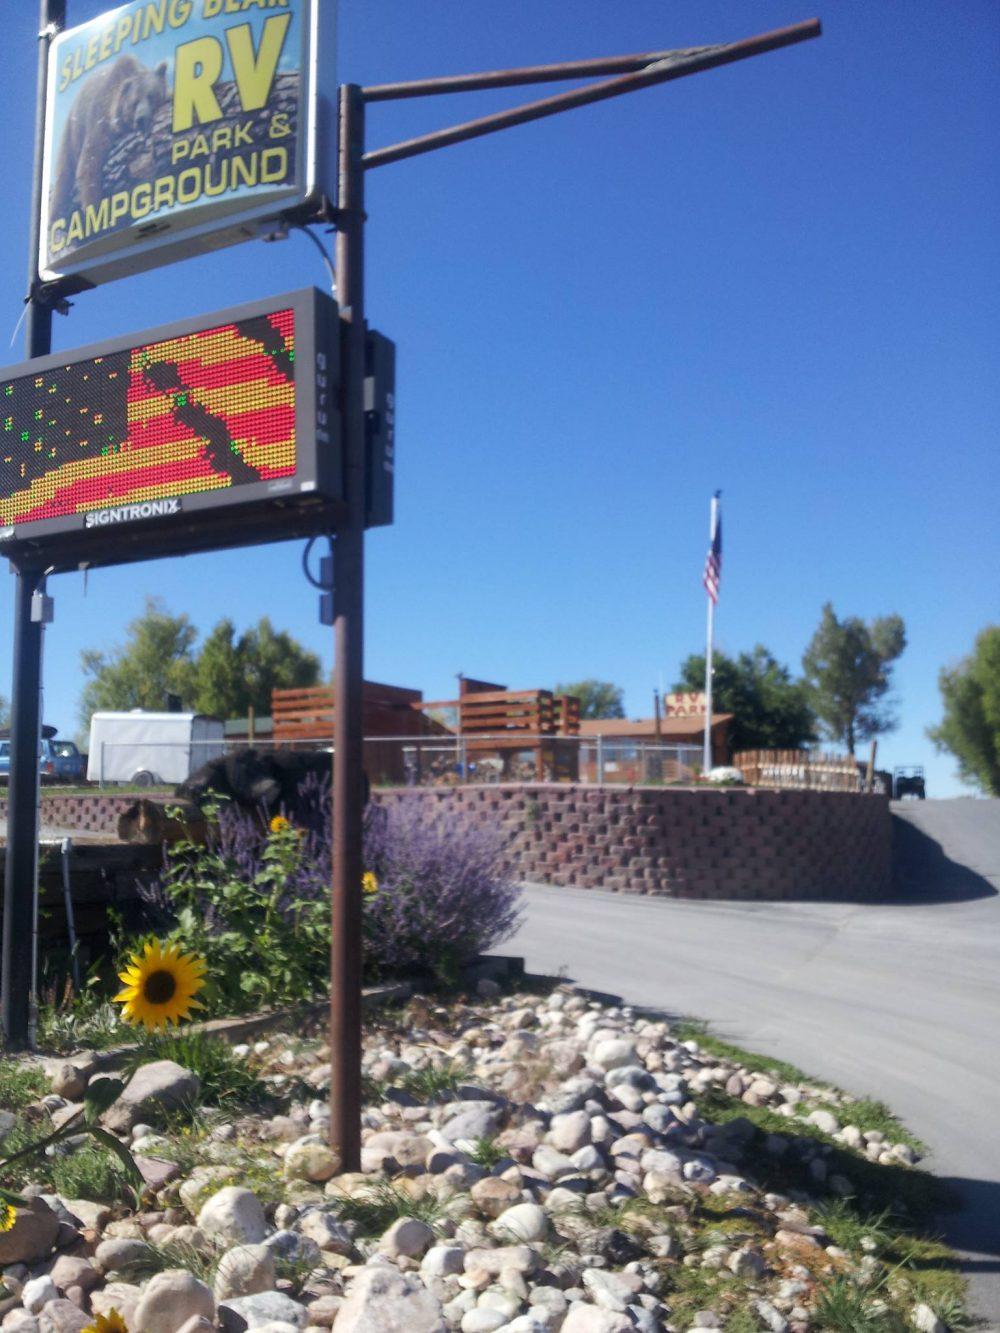 Sleeping Bear RV Park & Campground - park Sign